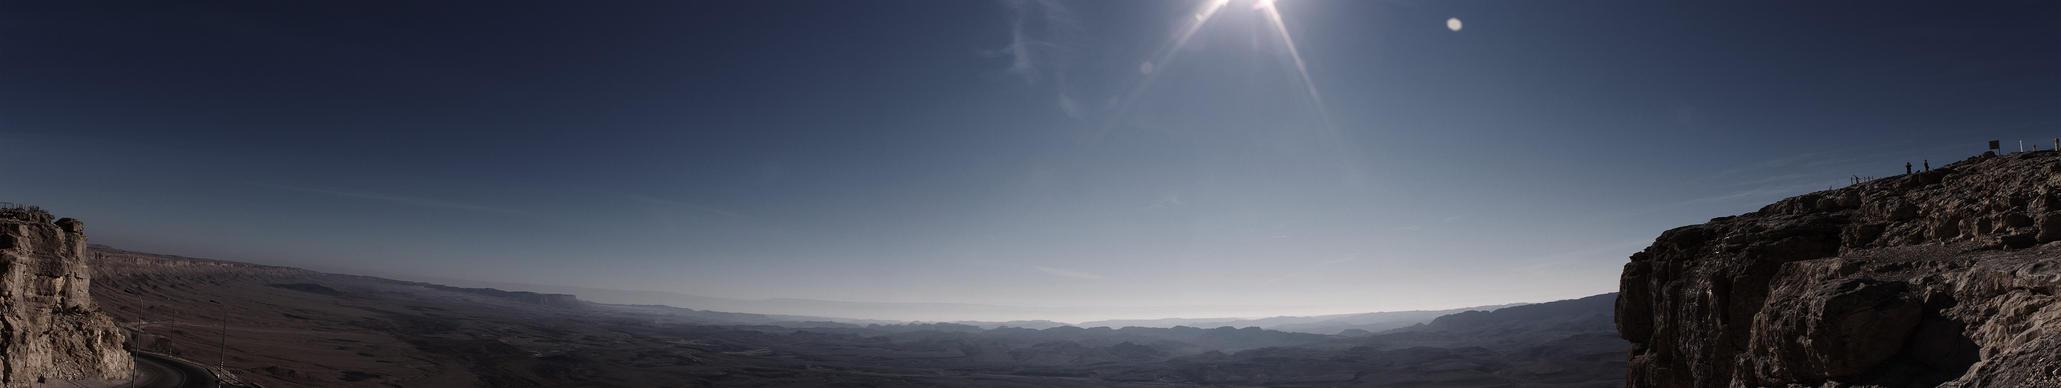 Ramon Crater Panorama by PaulEnsane